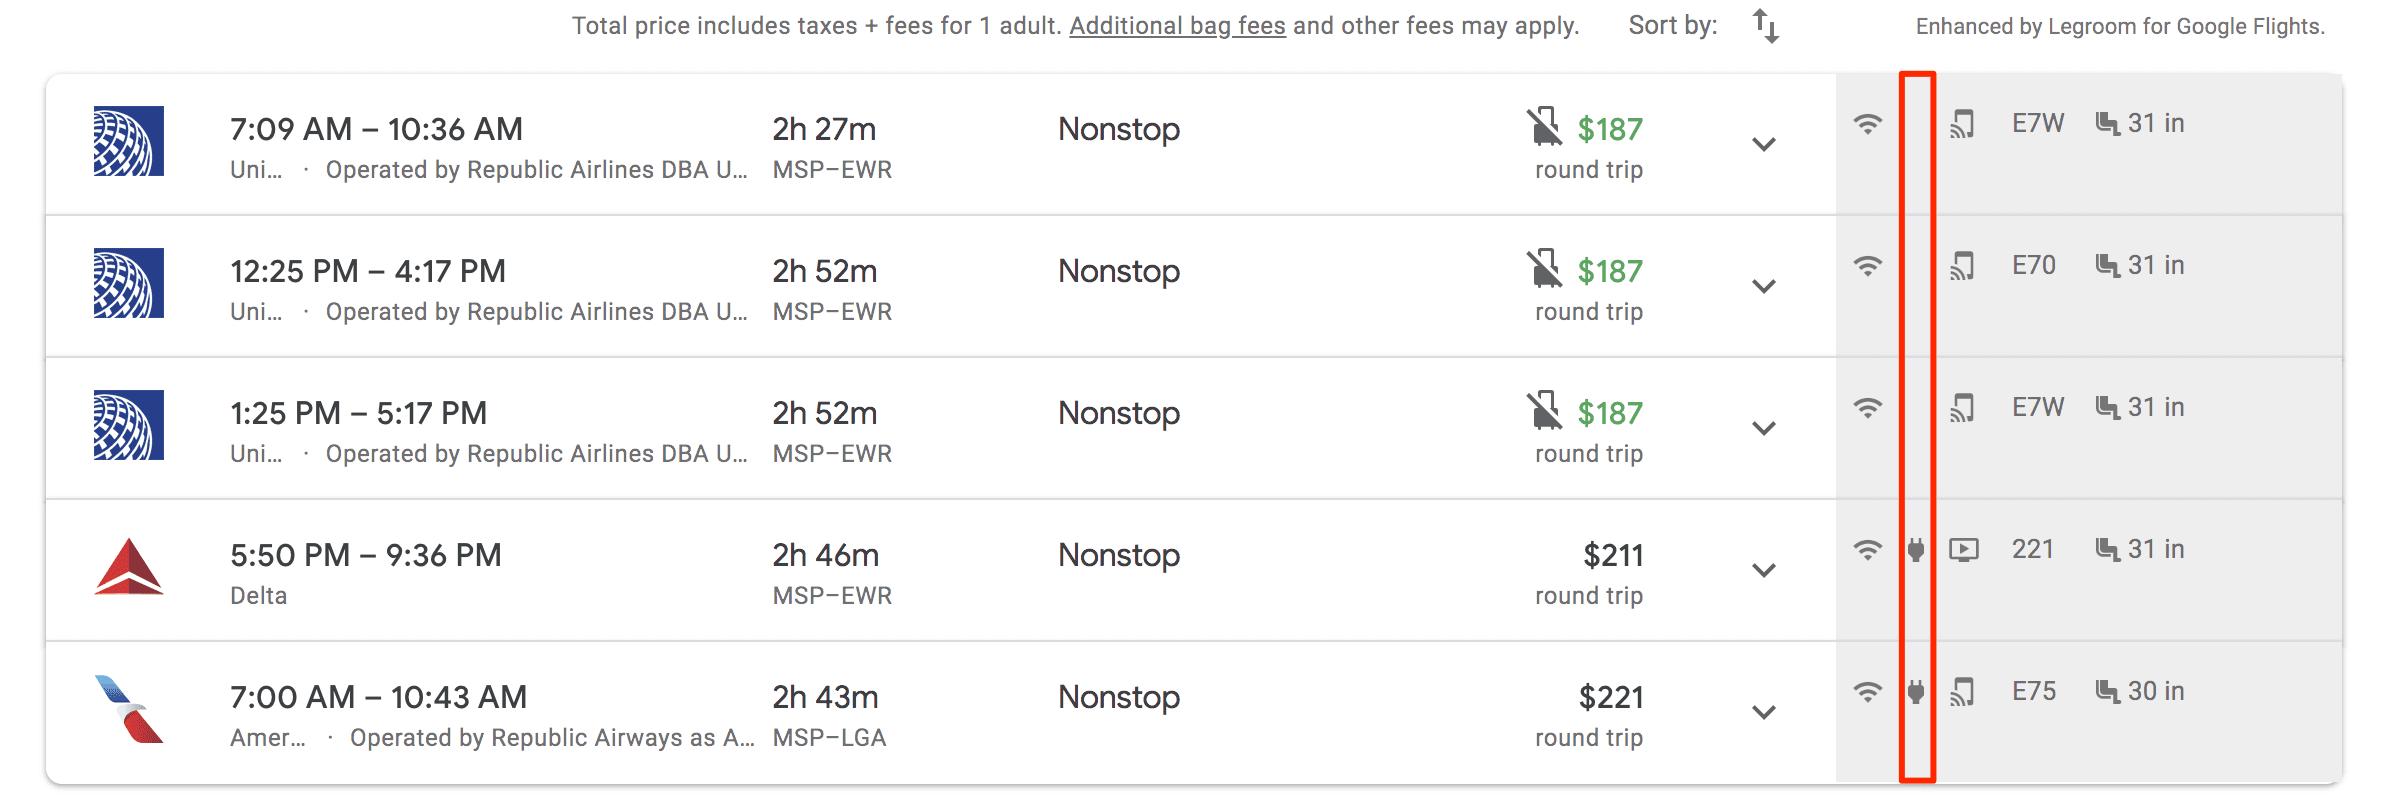 google flights legrooms charging